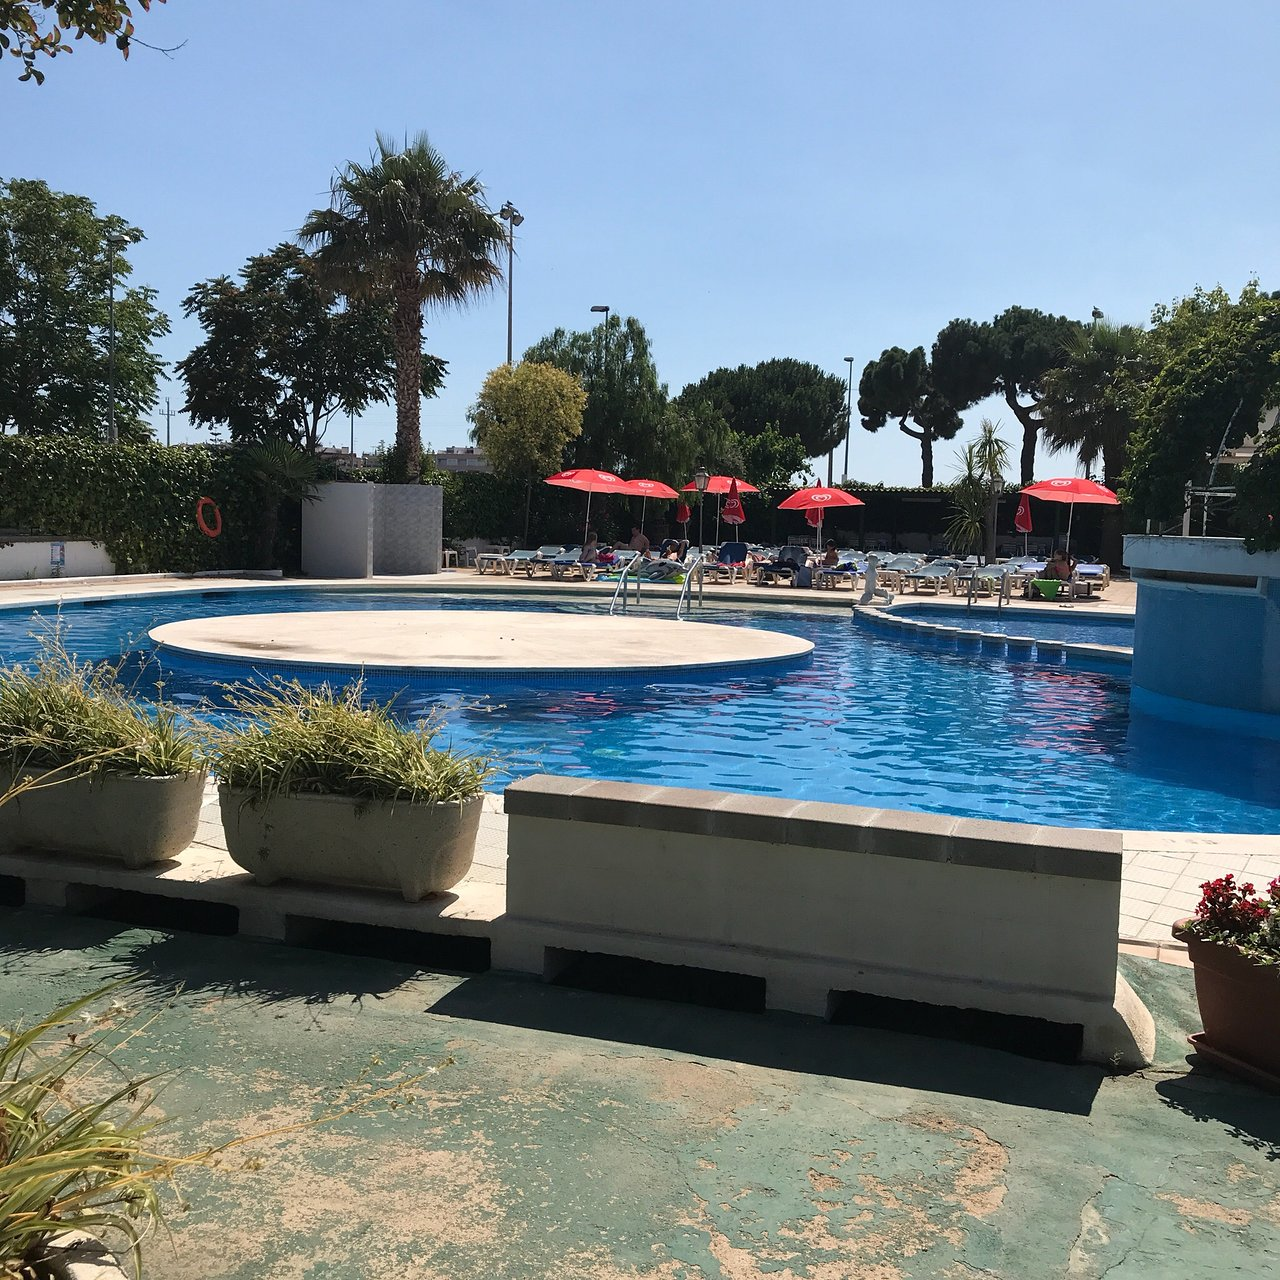 fergus paradis park updated 2019 prices inn reviews and photos rh tripadvisor co uk